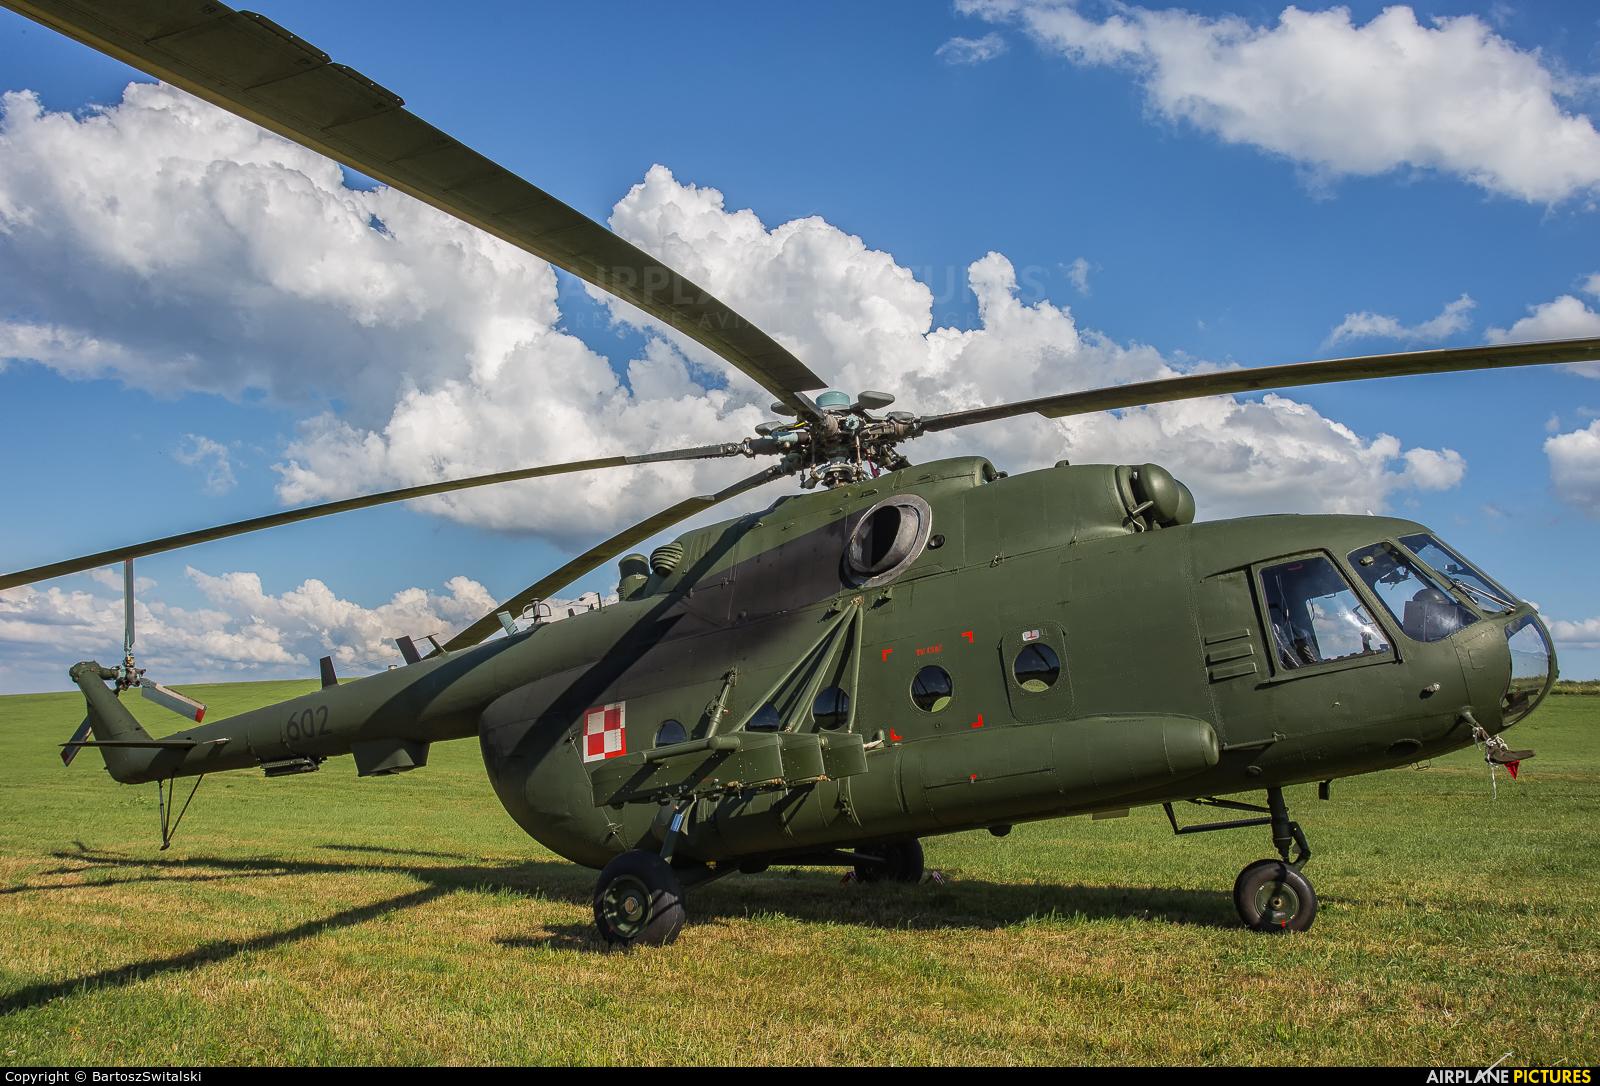 Poland - Army 602 aircraft at Off Airport - Poland